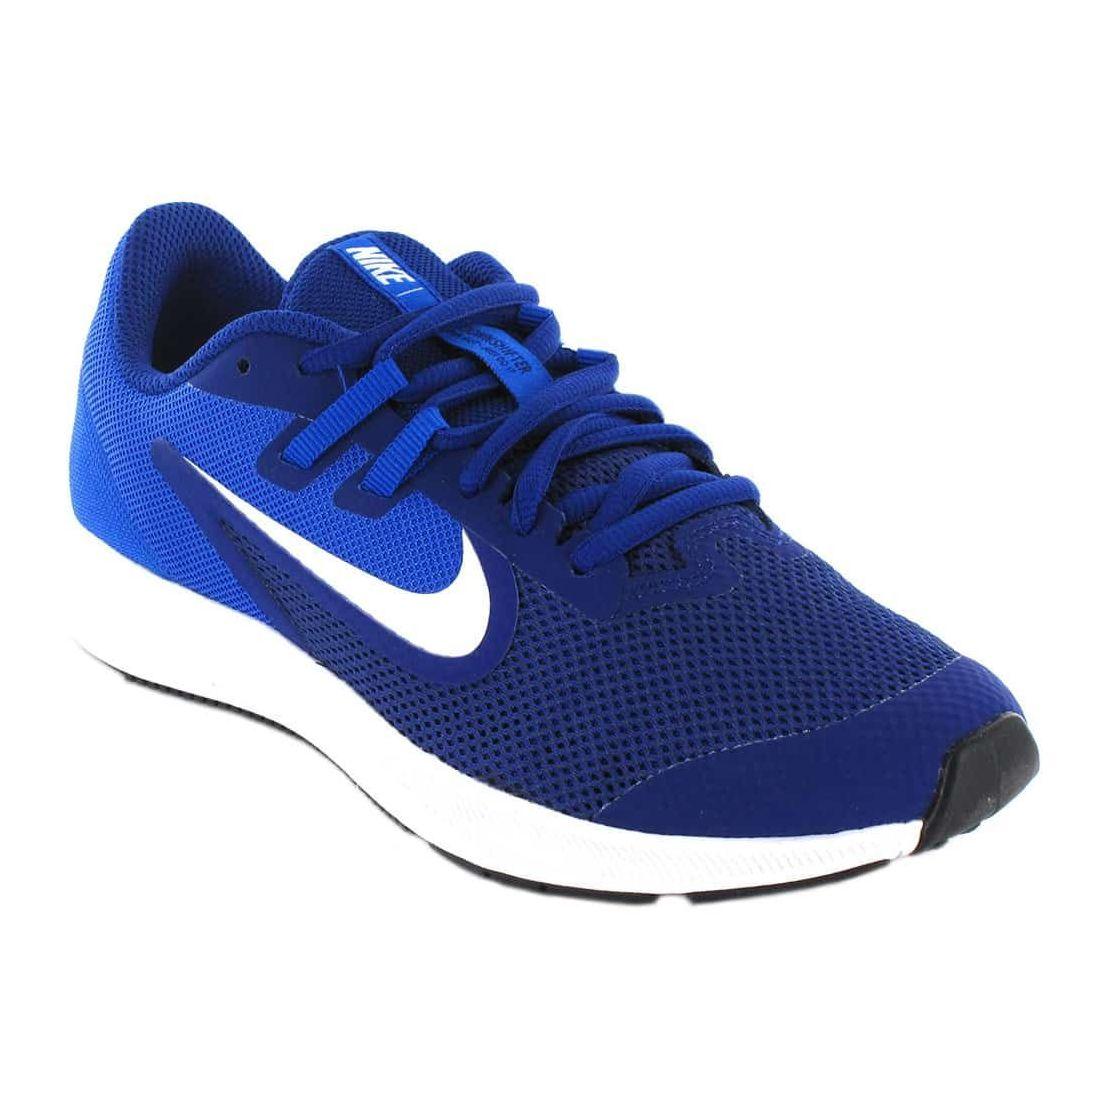 Nike Downshifter 9 GS 400